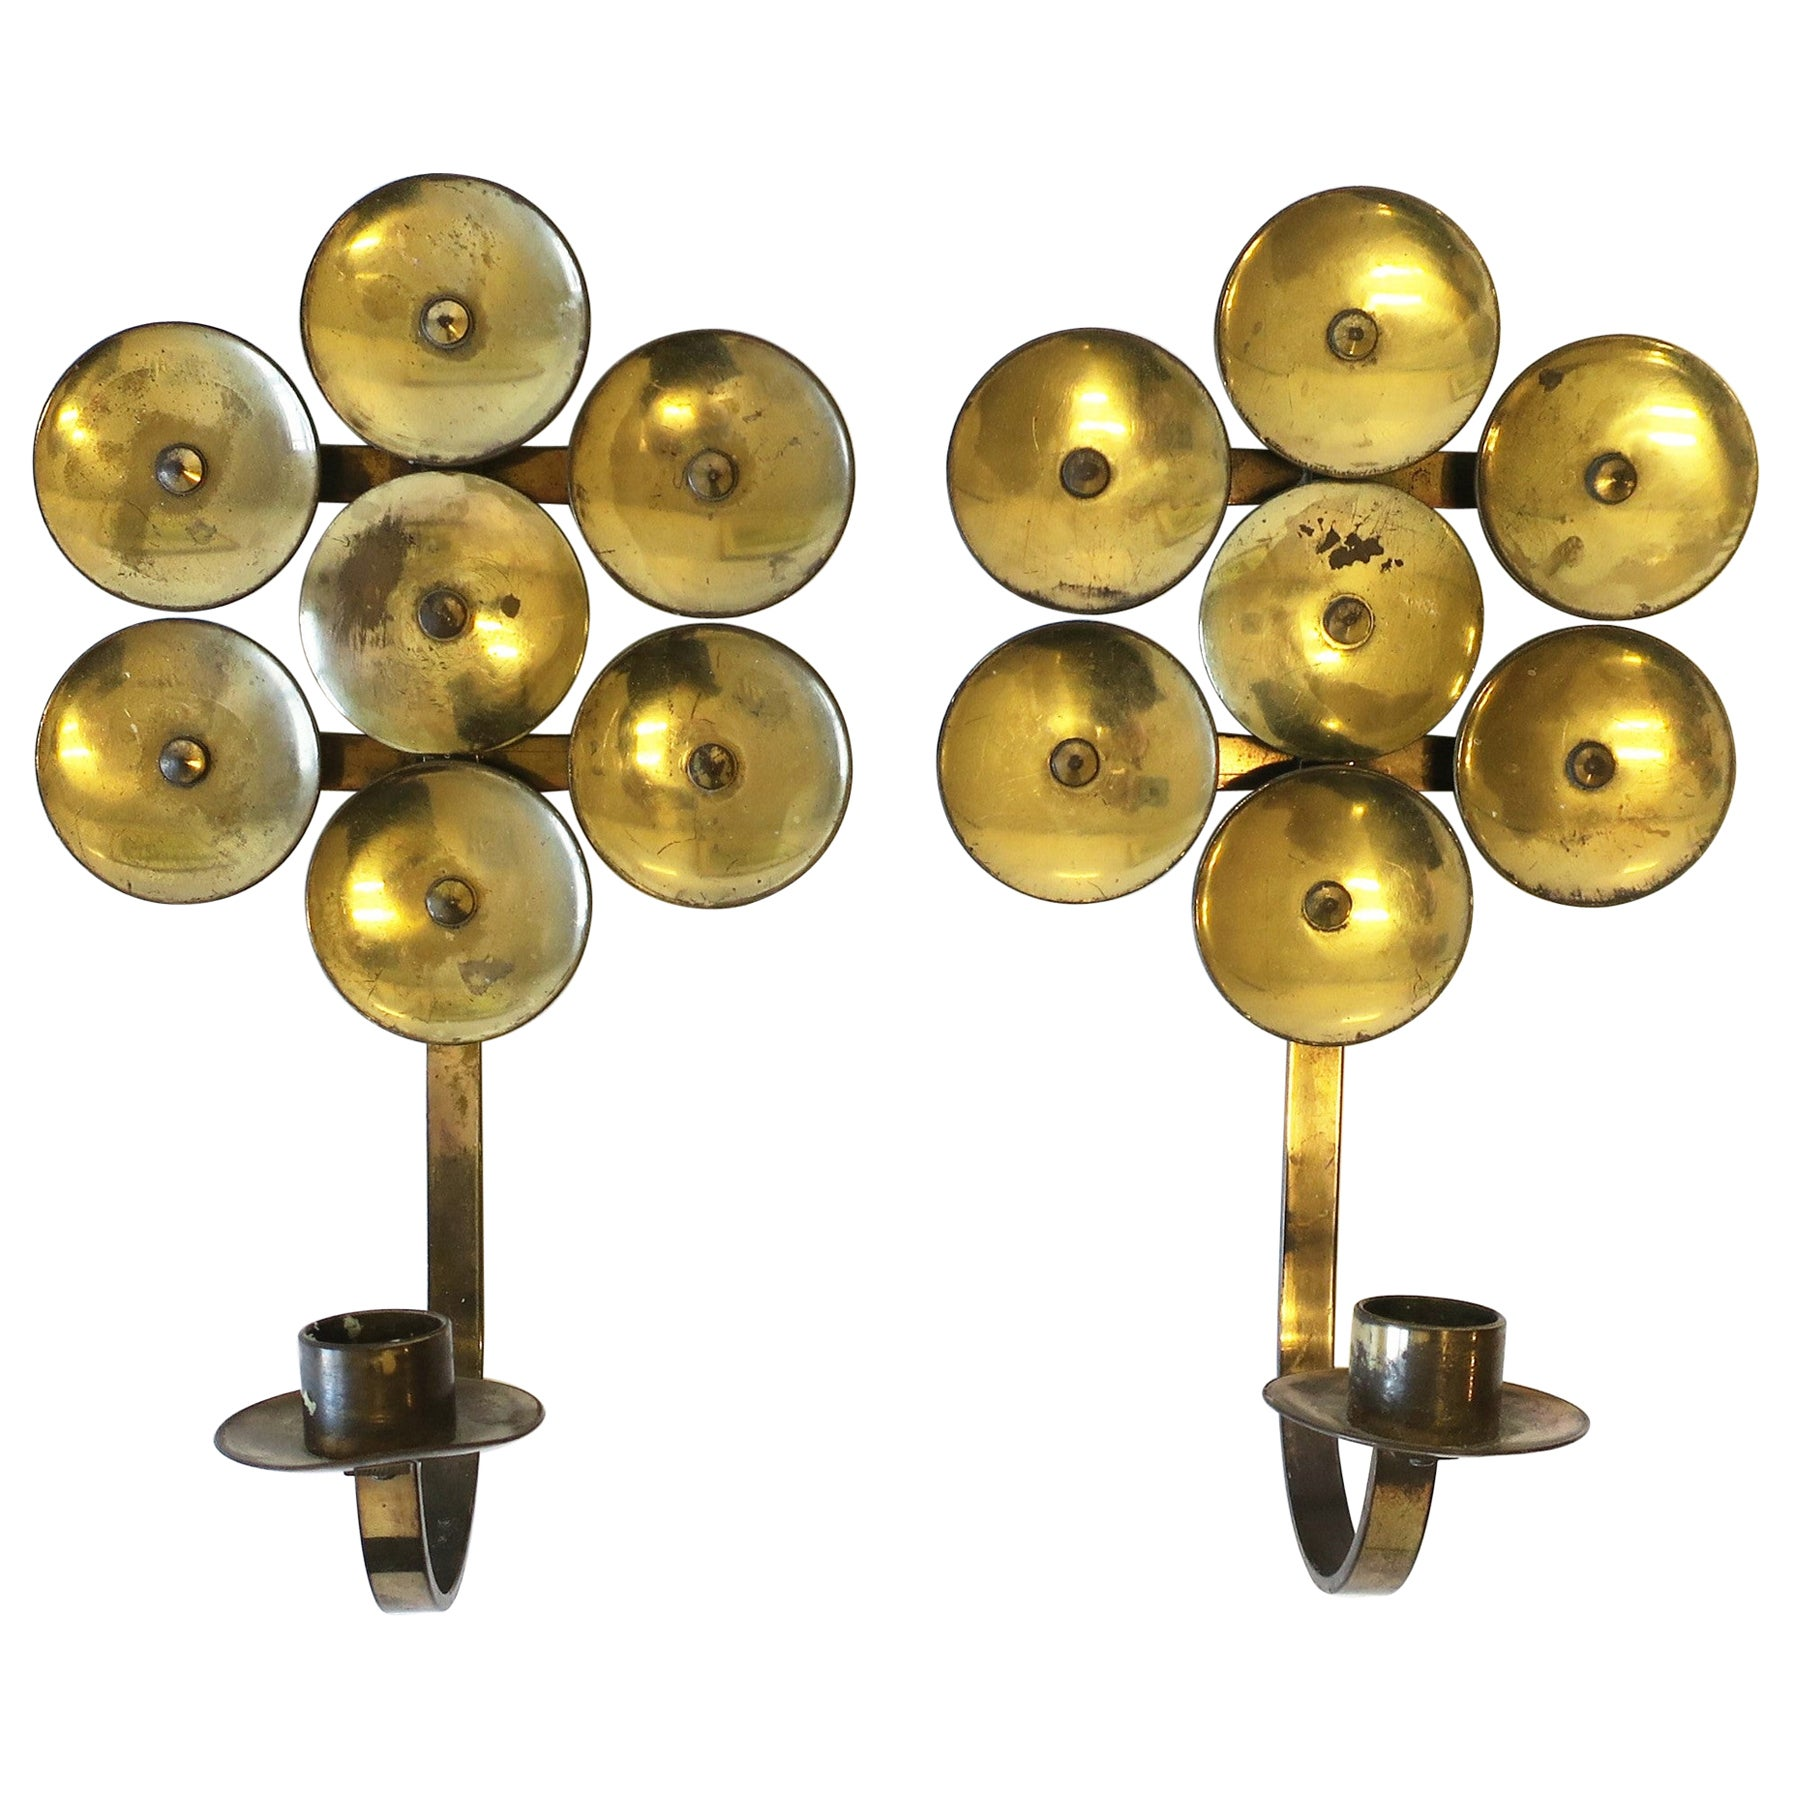 Scandinavian Modern Swedish Brass Wall Candle Sconces, Pair